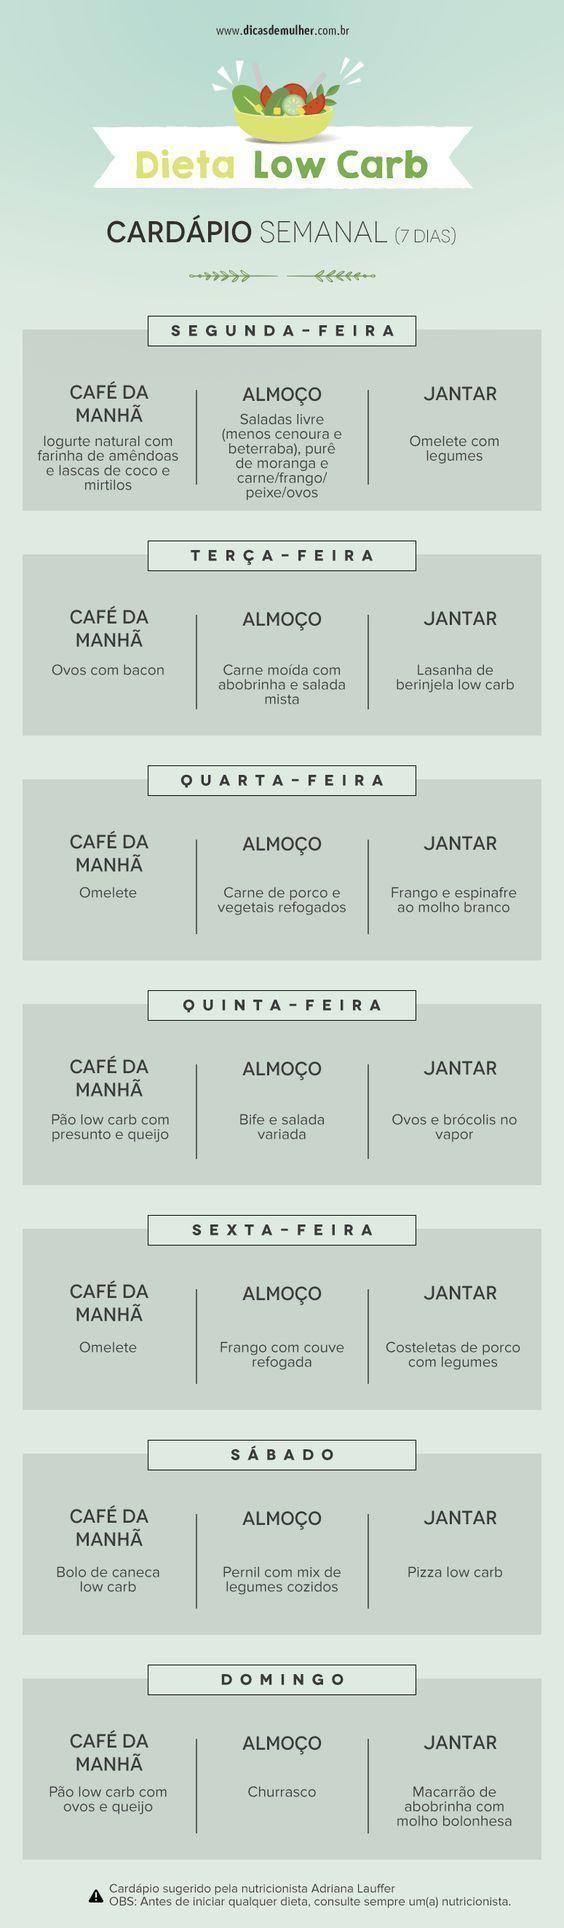 dieta low carb menu settimanale)